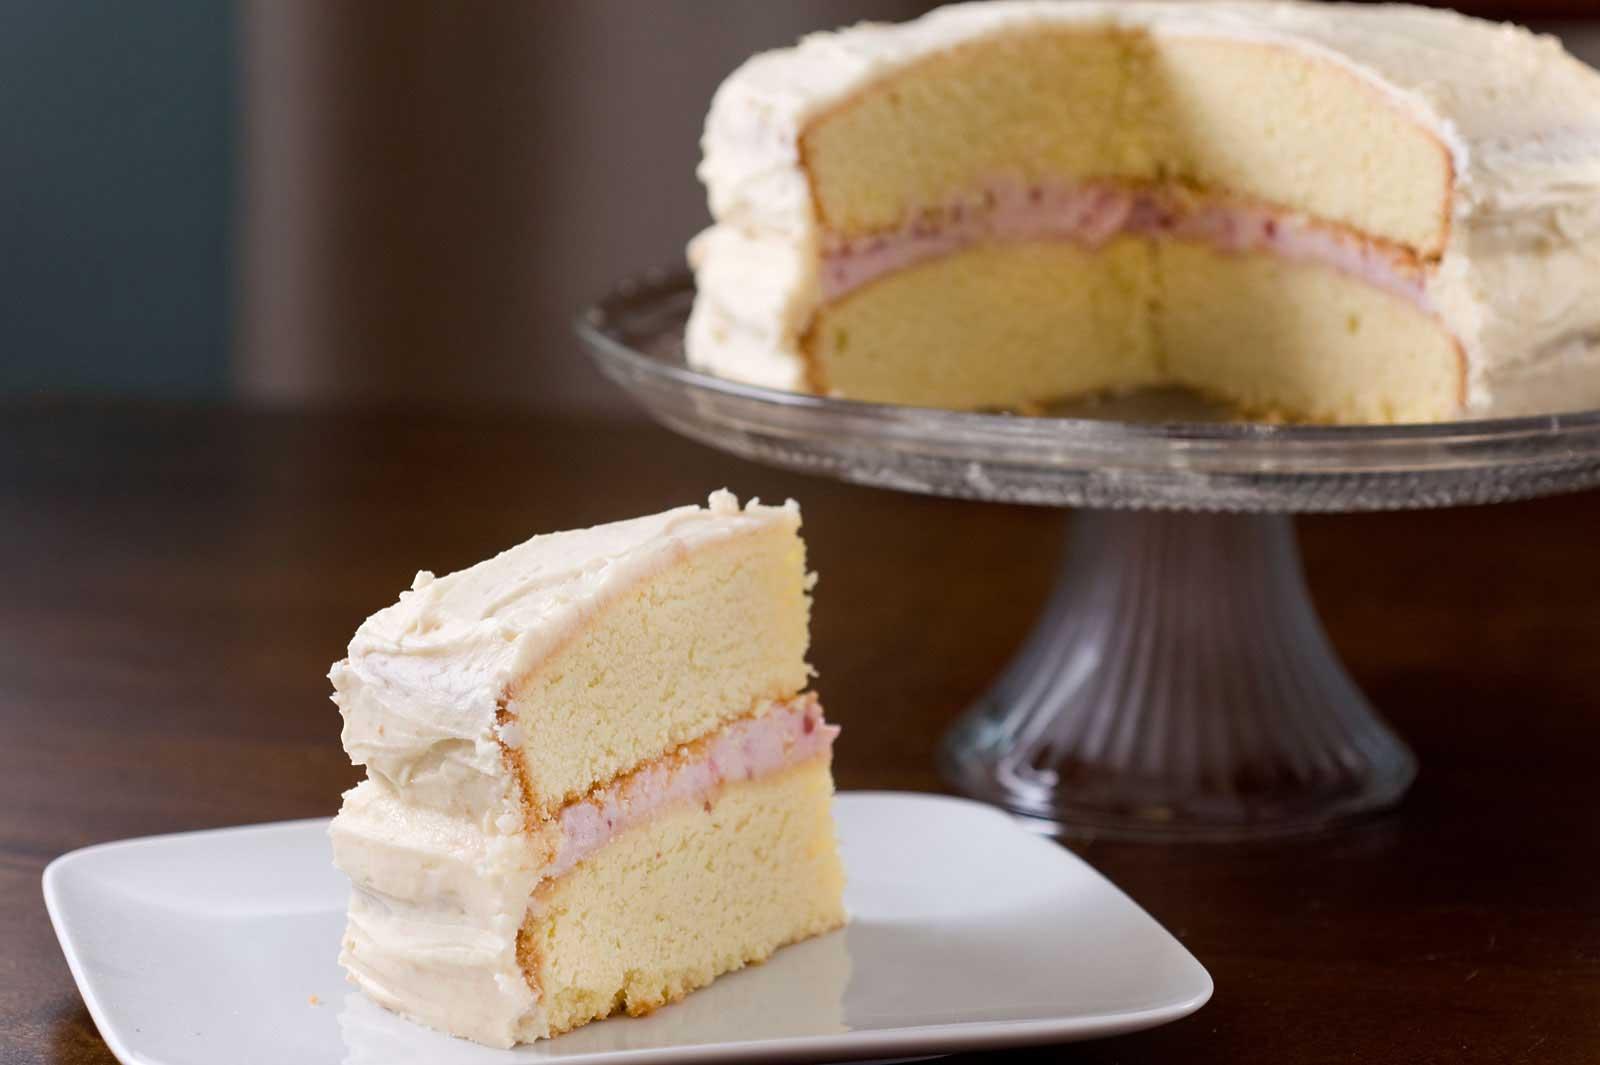 creamy raspberry cake filling